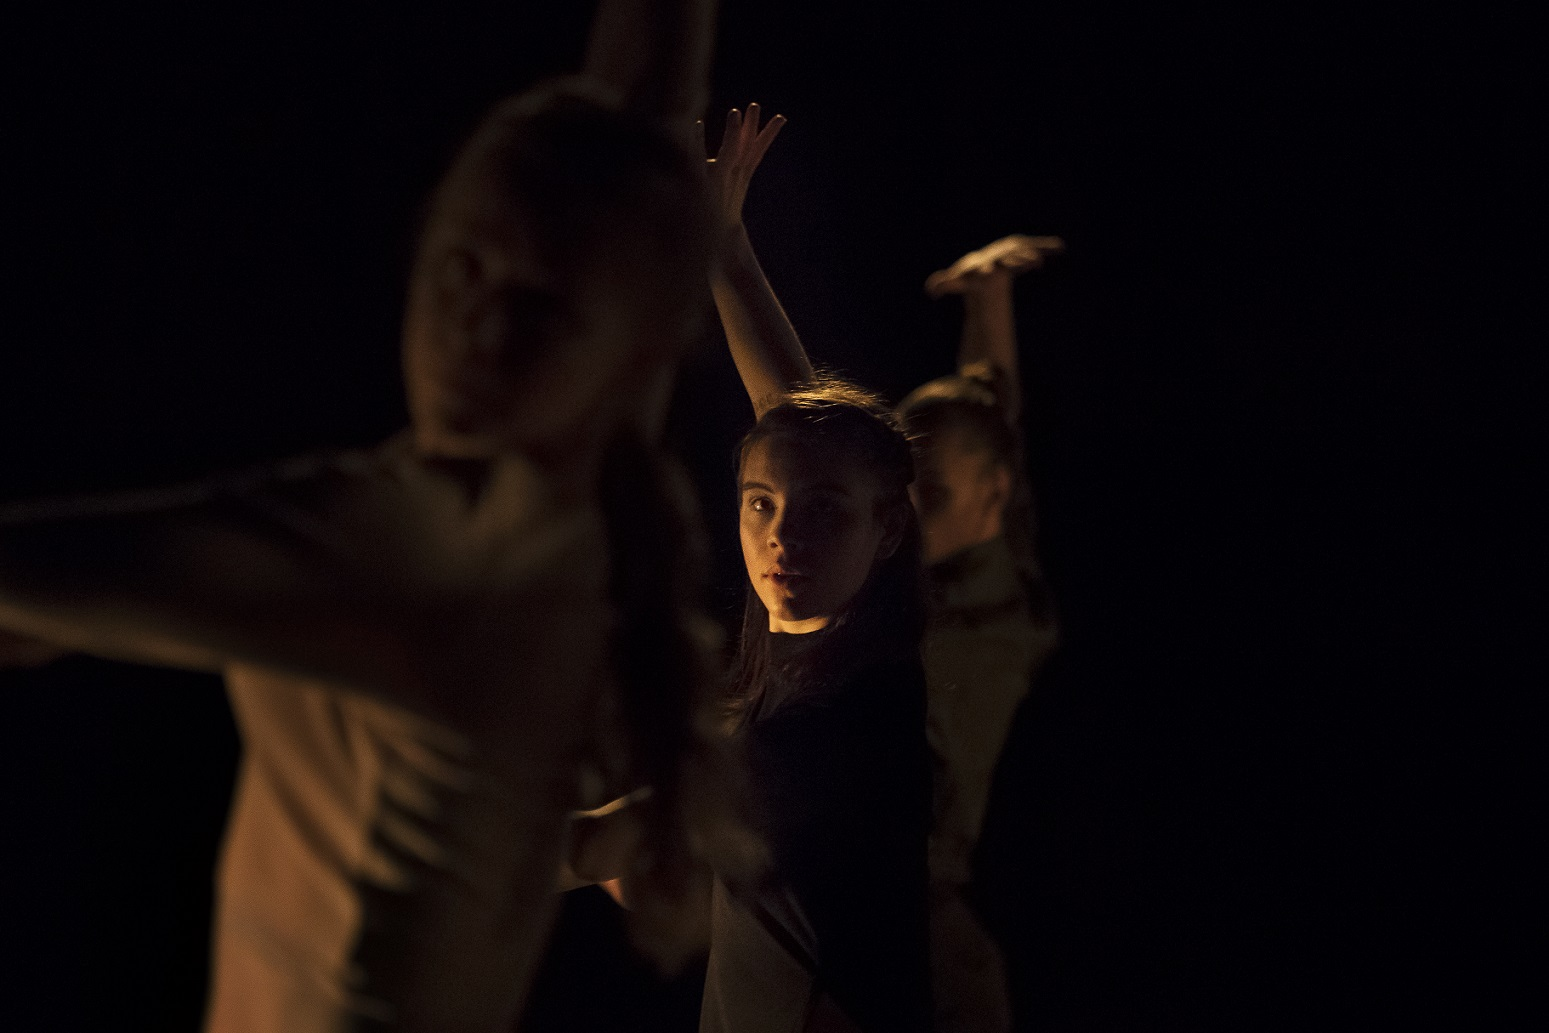 170303 Marika Renhuvud performs during a show on March 3, 2017 at the Ballet Academy in Stockholm, Sweden. Photo: Joel Marklund / BILDBYRN